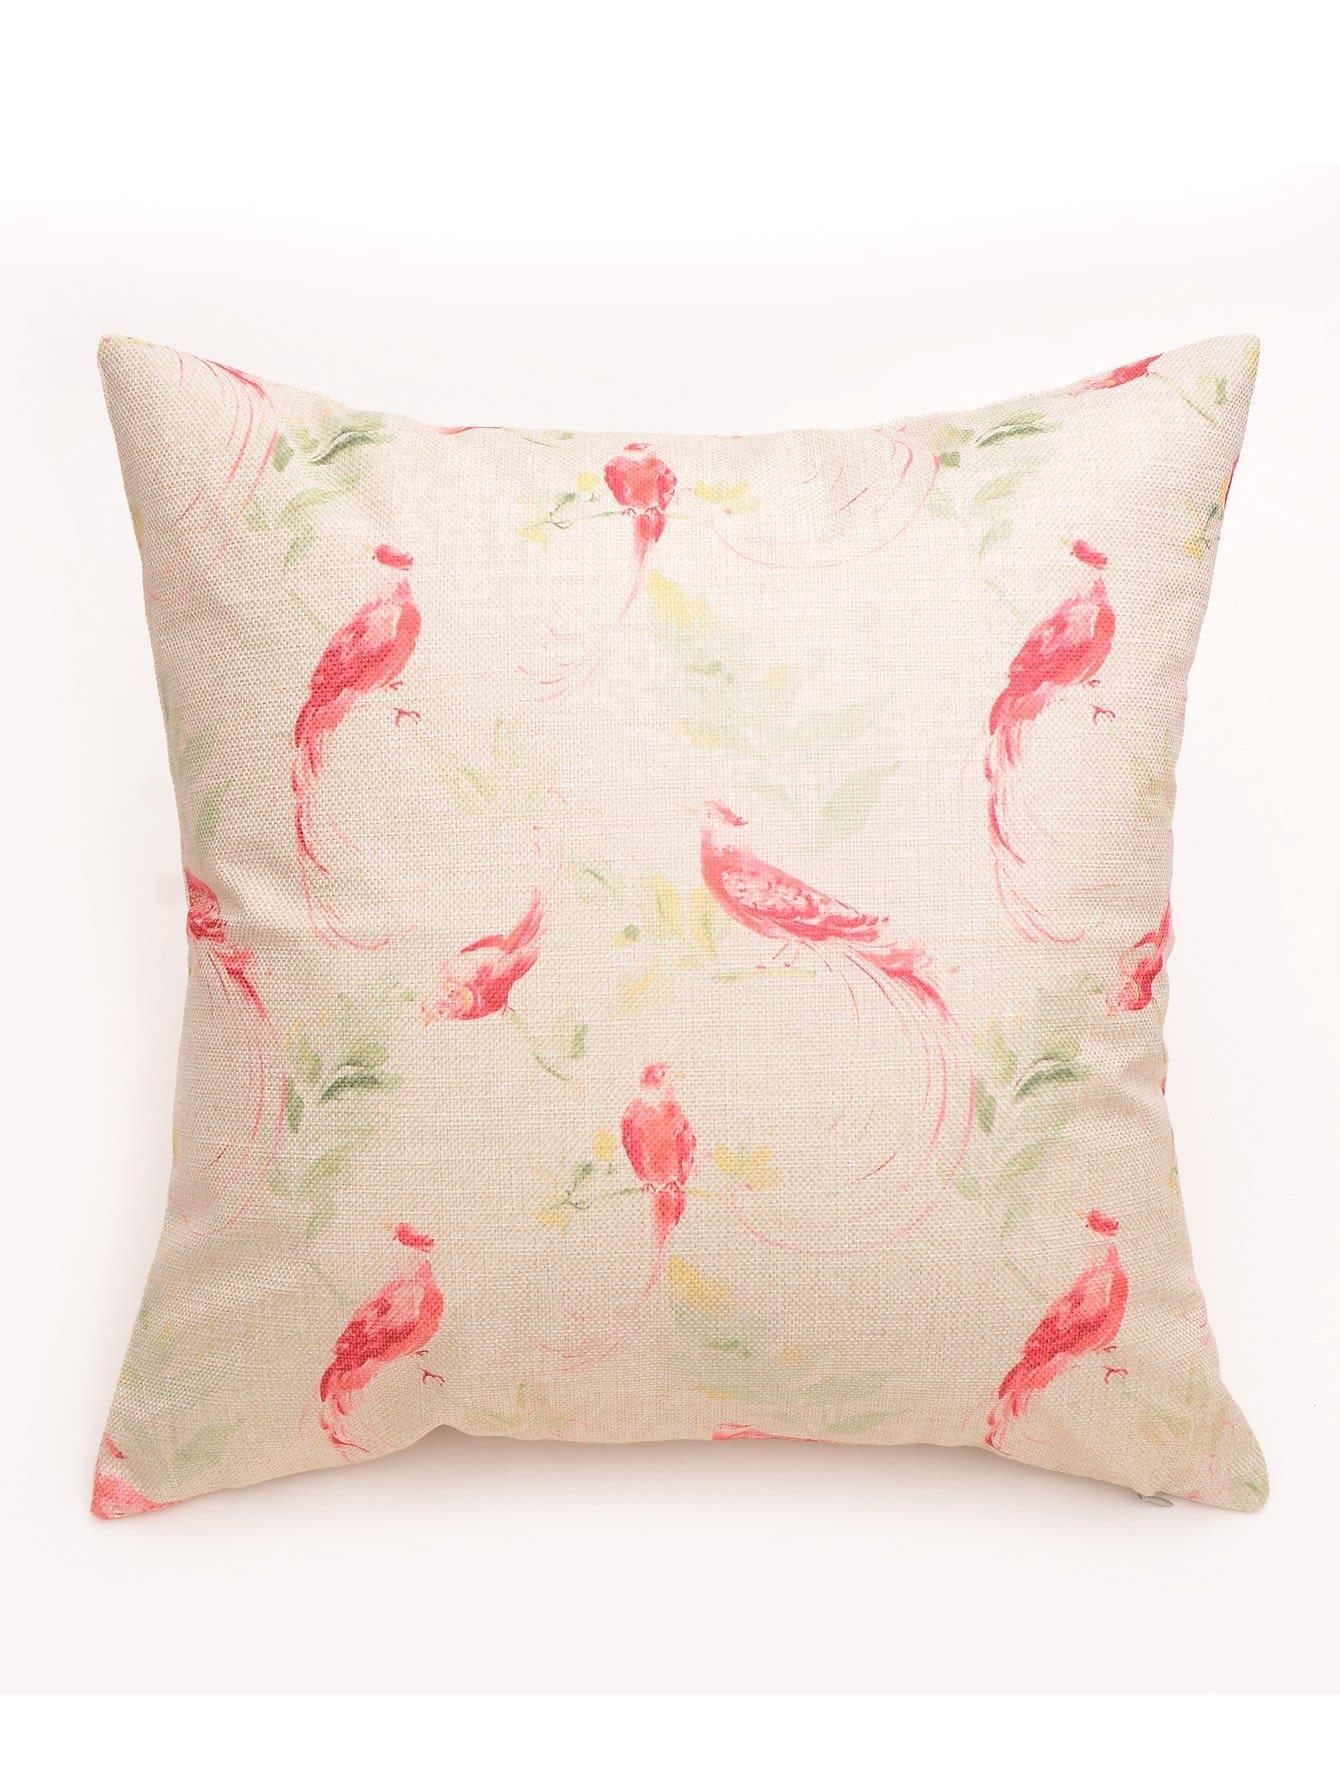 Купить Наволочка с рисунками птиц, null, SheIn